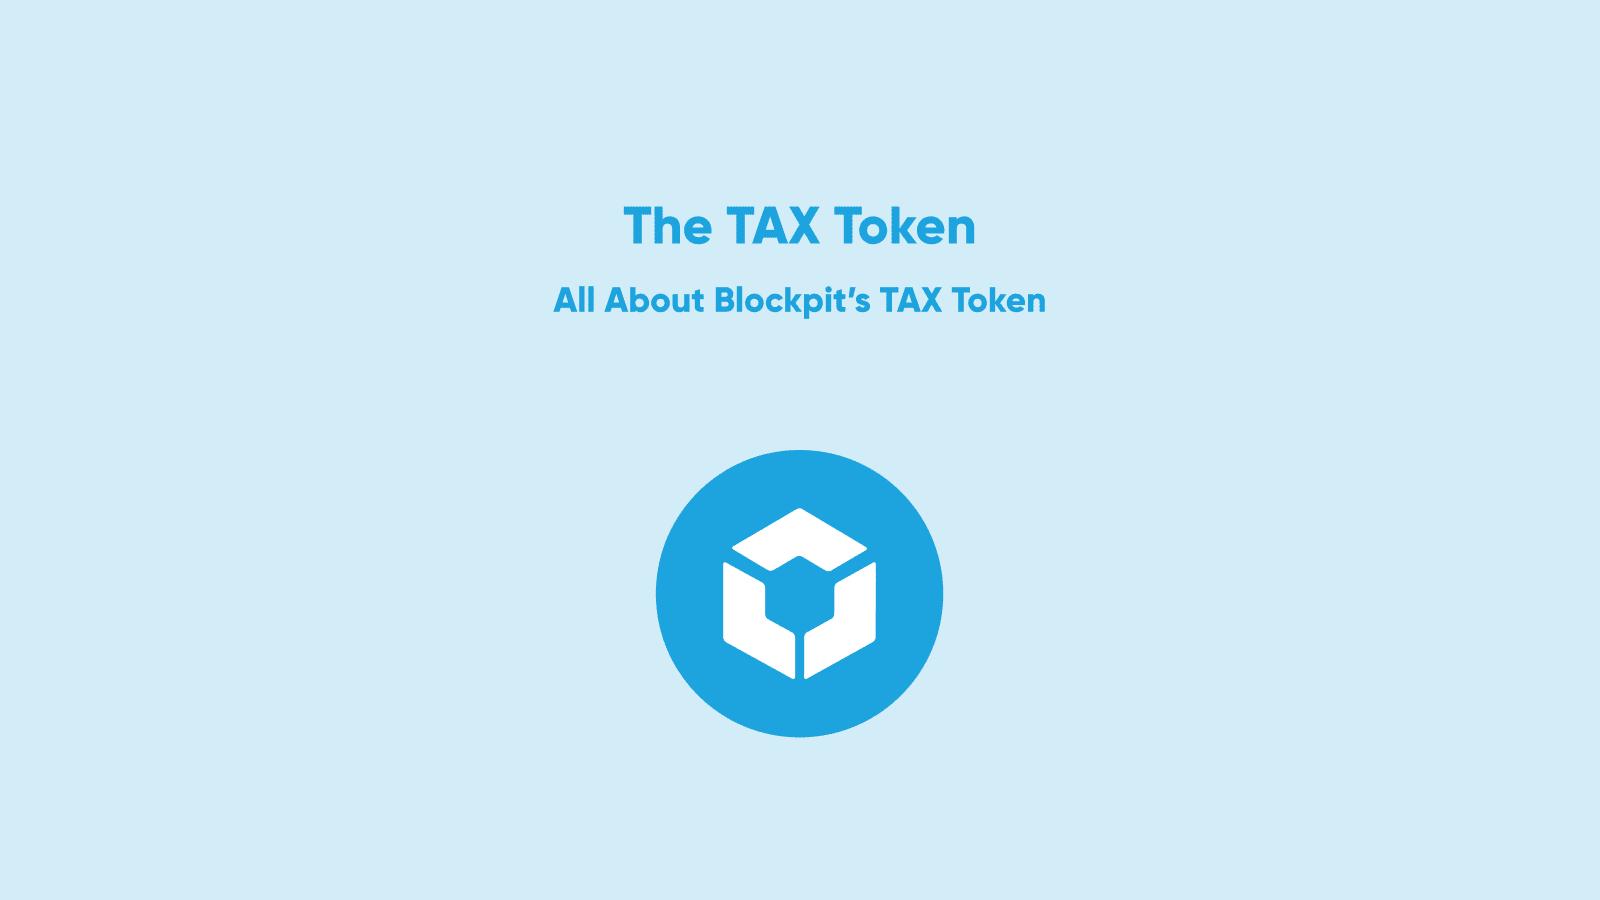 blockpit tax taxation sto token blockchain ethereum bitcoin crypto cryptocurrency